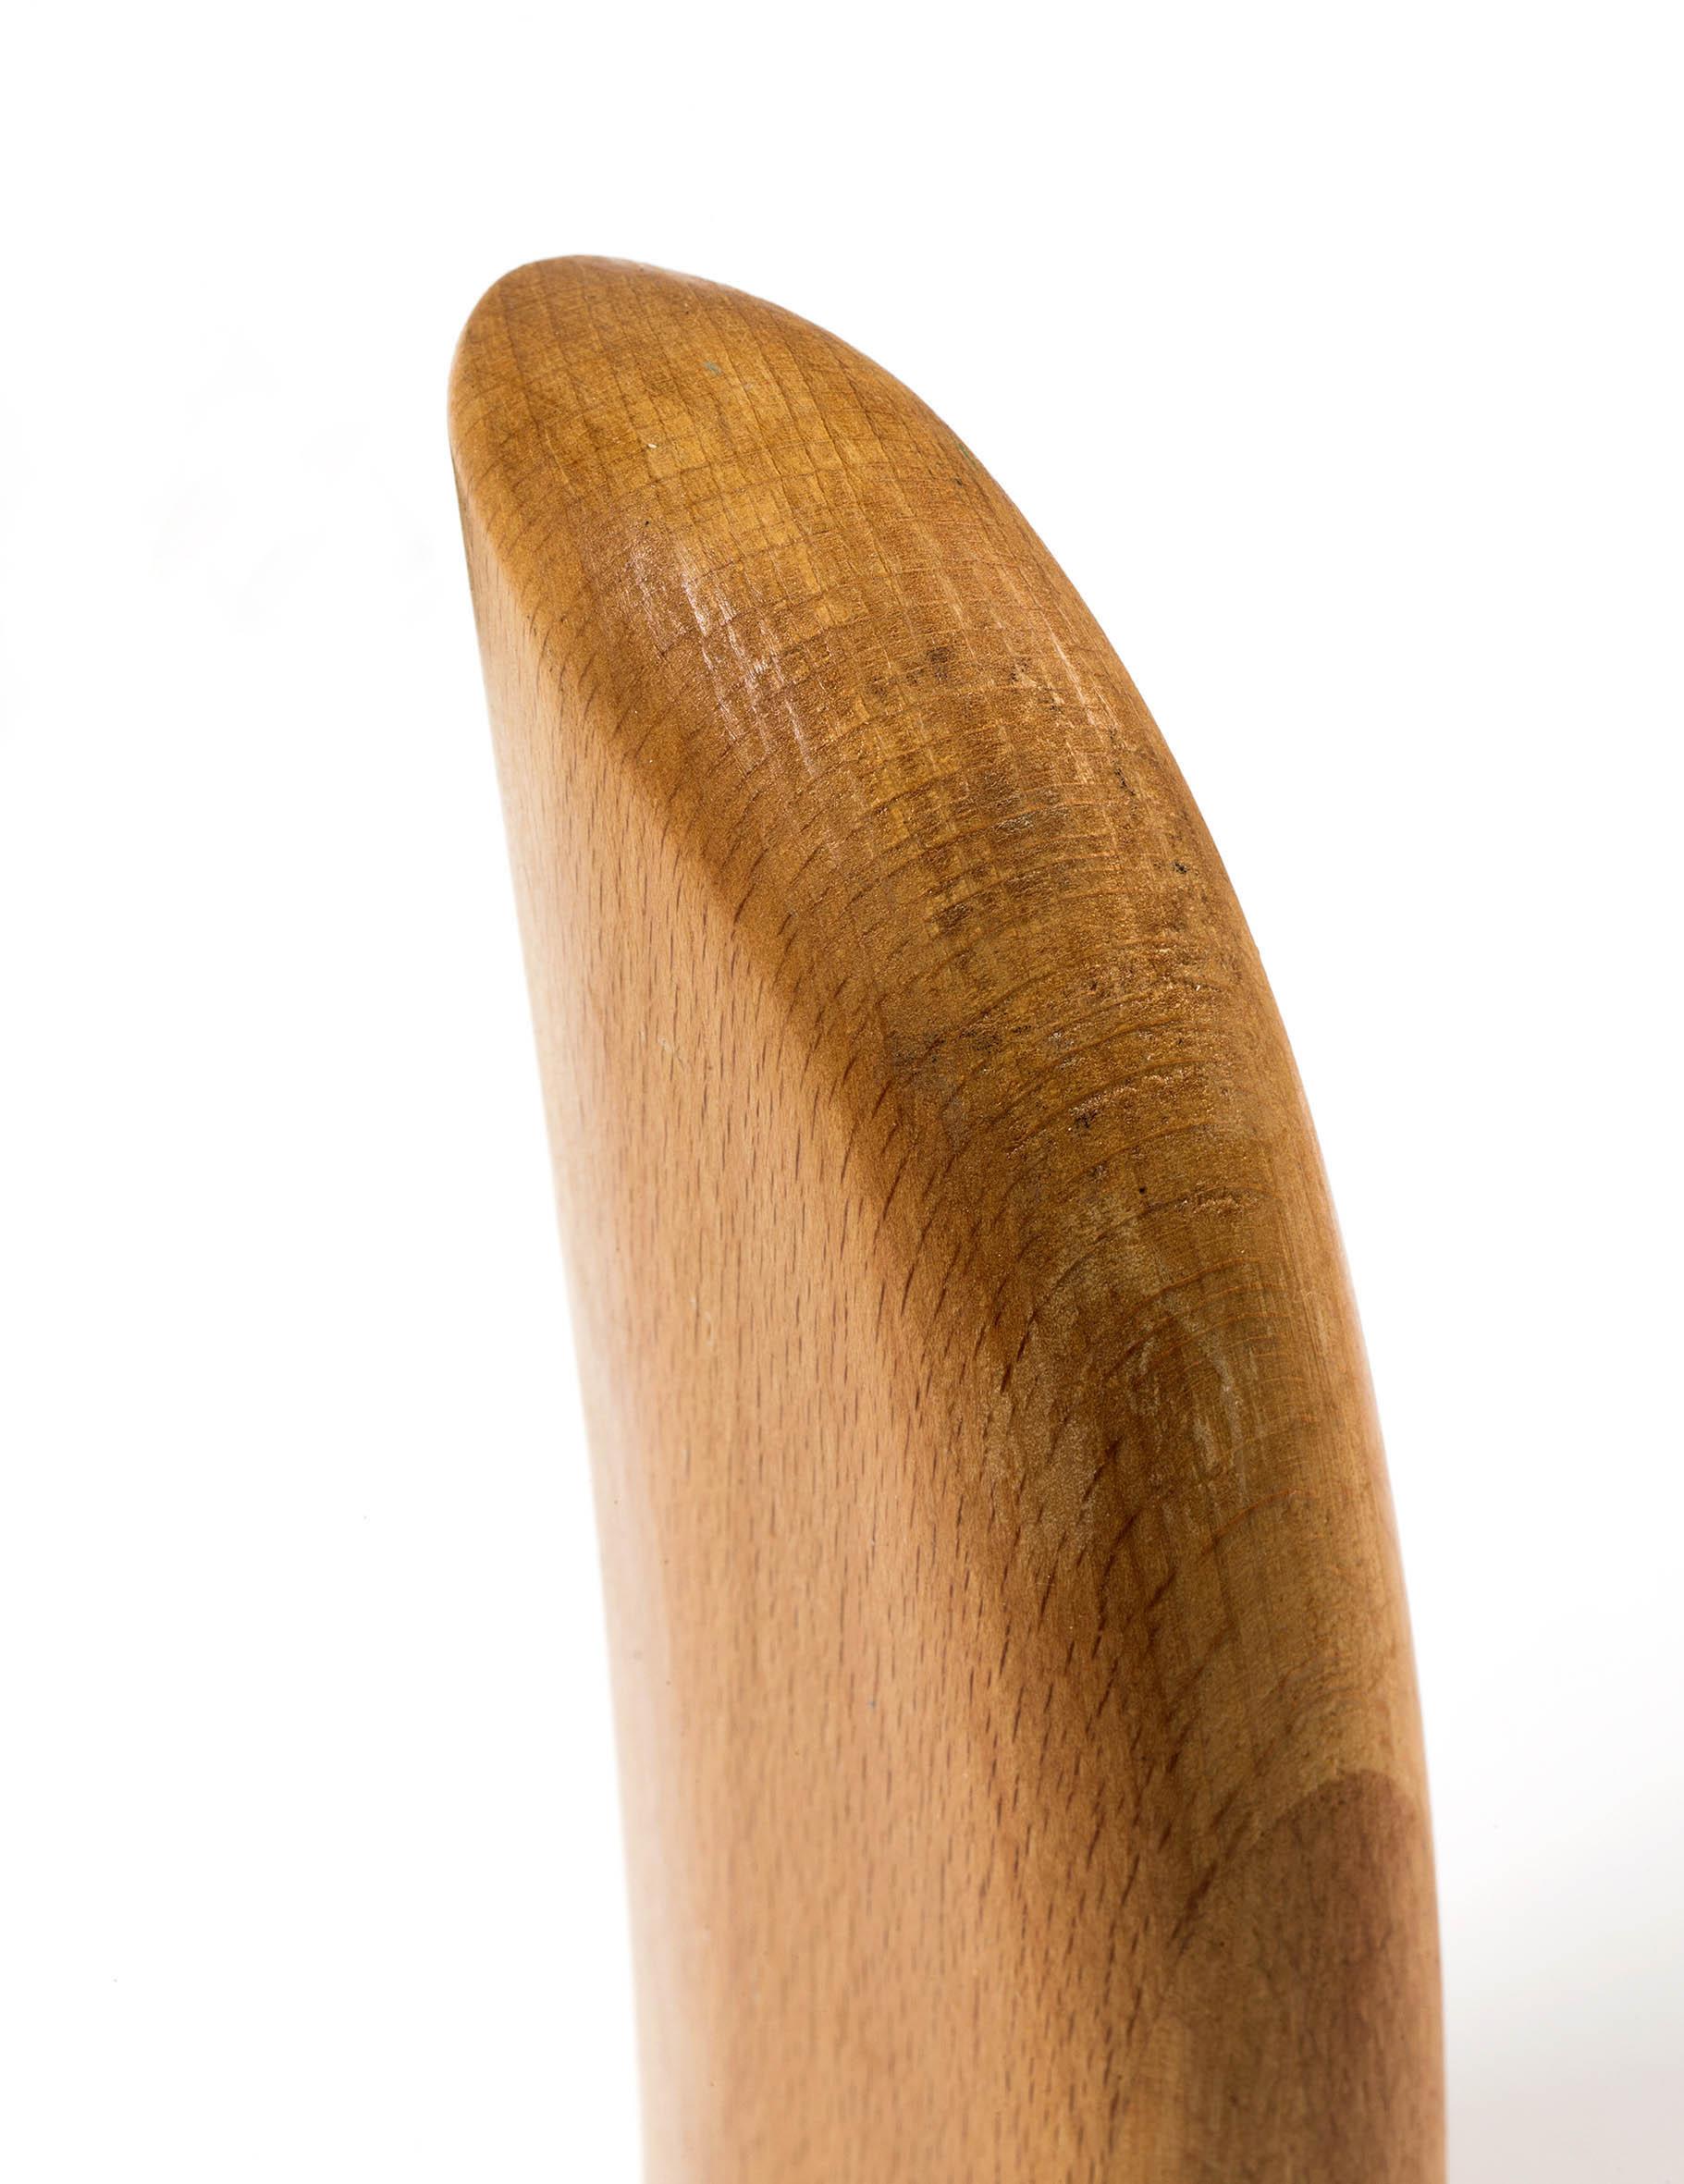 Sanded wood part.